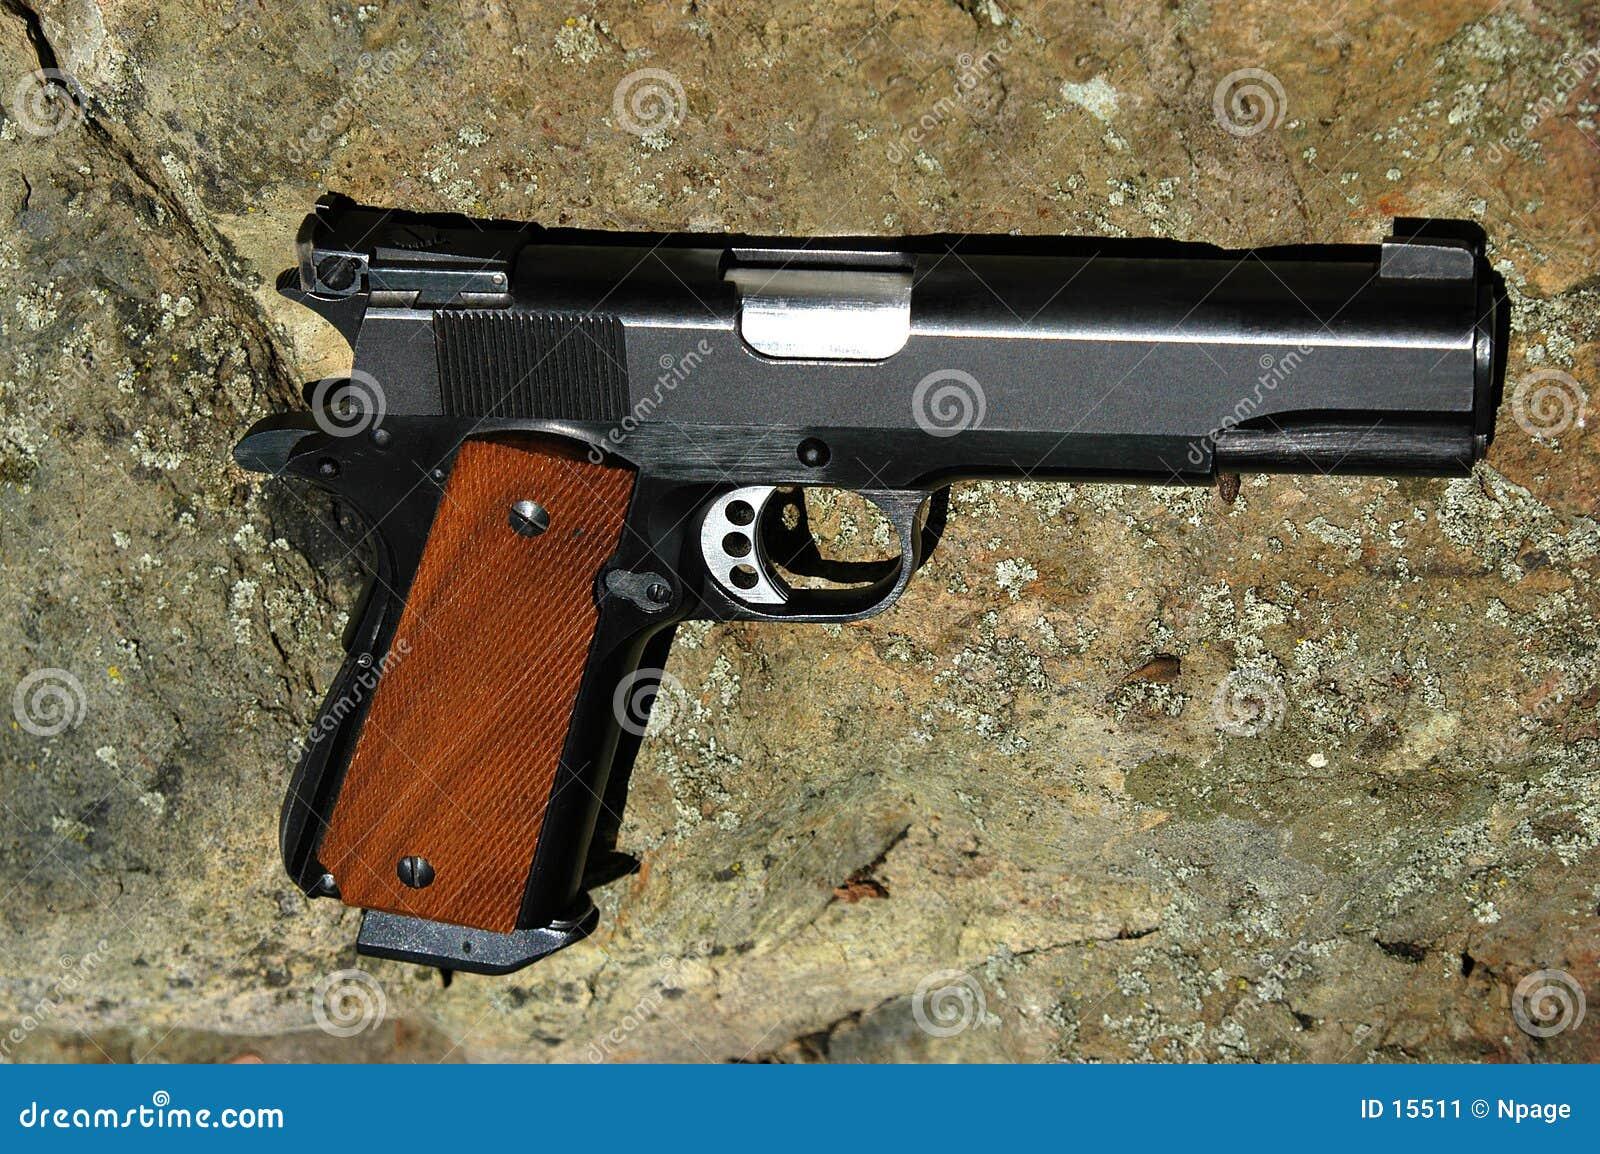 Cal 45 pistolet